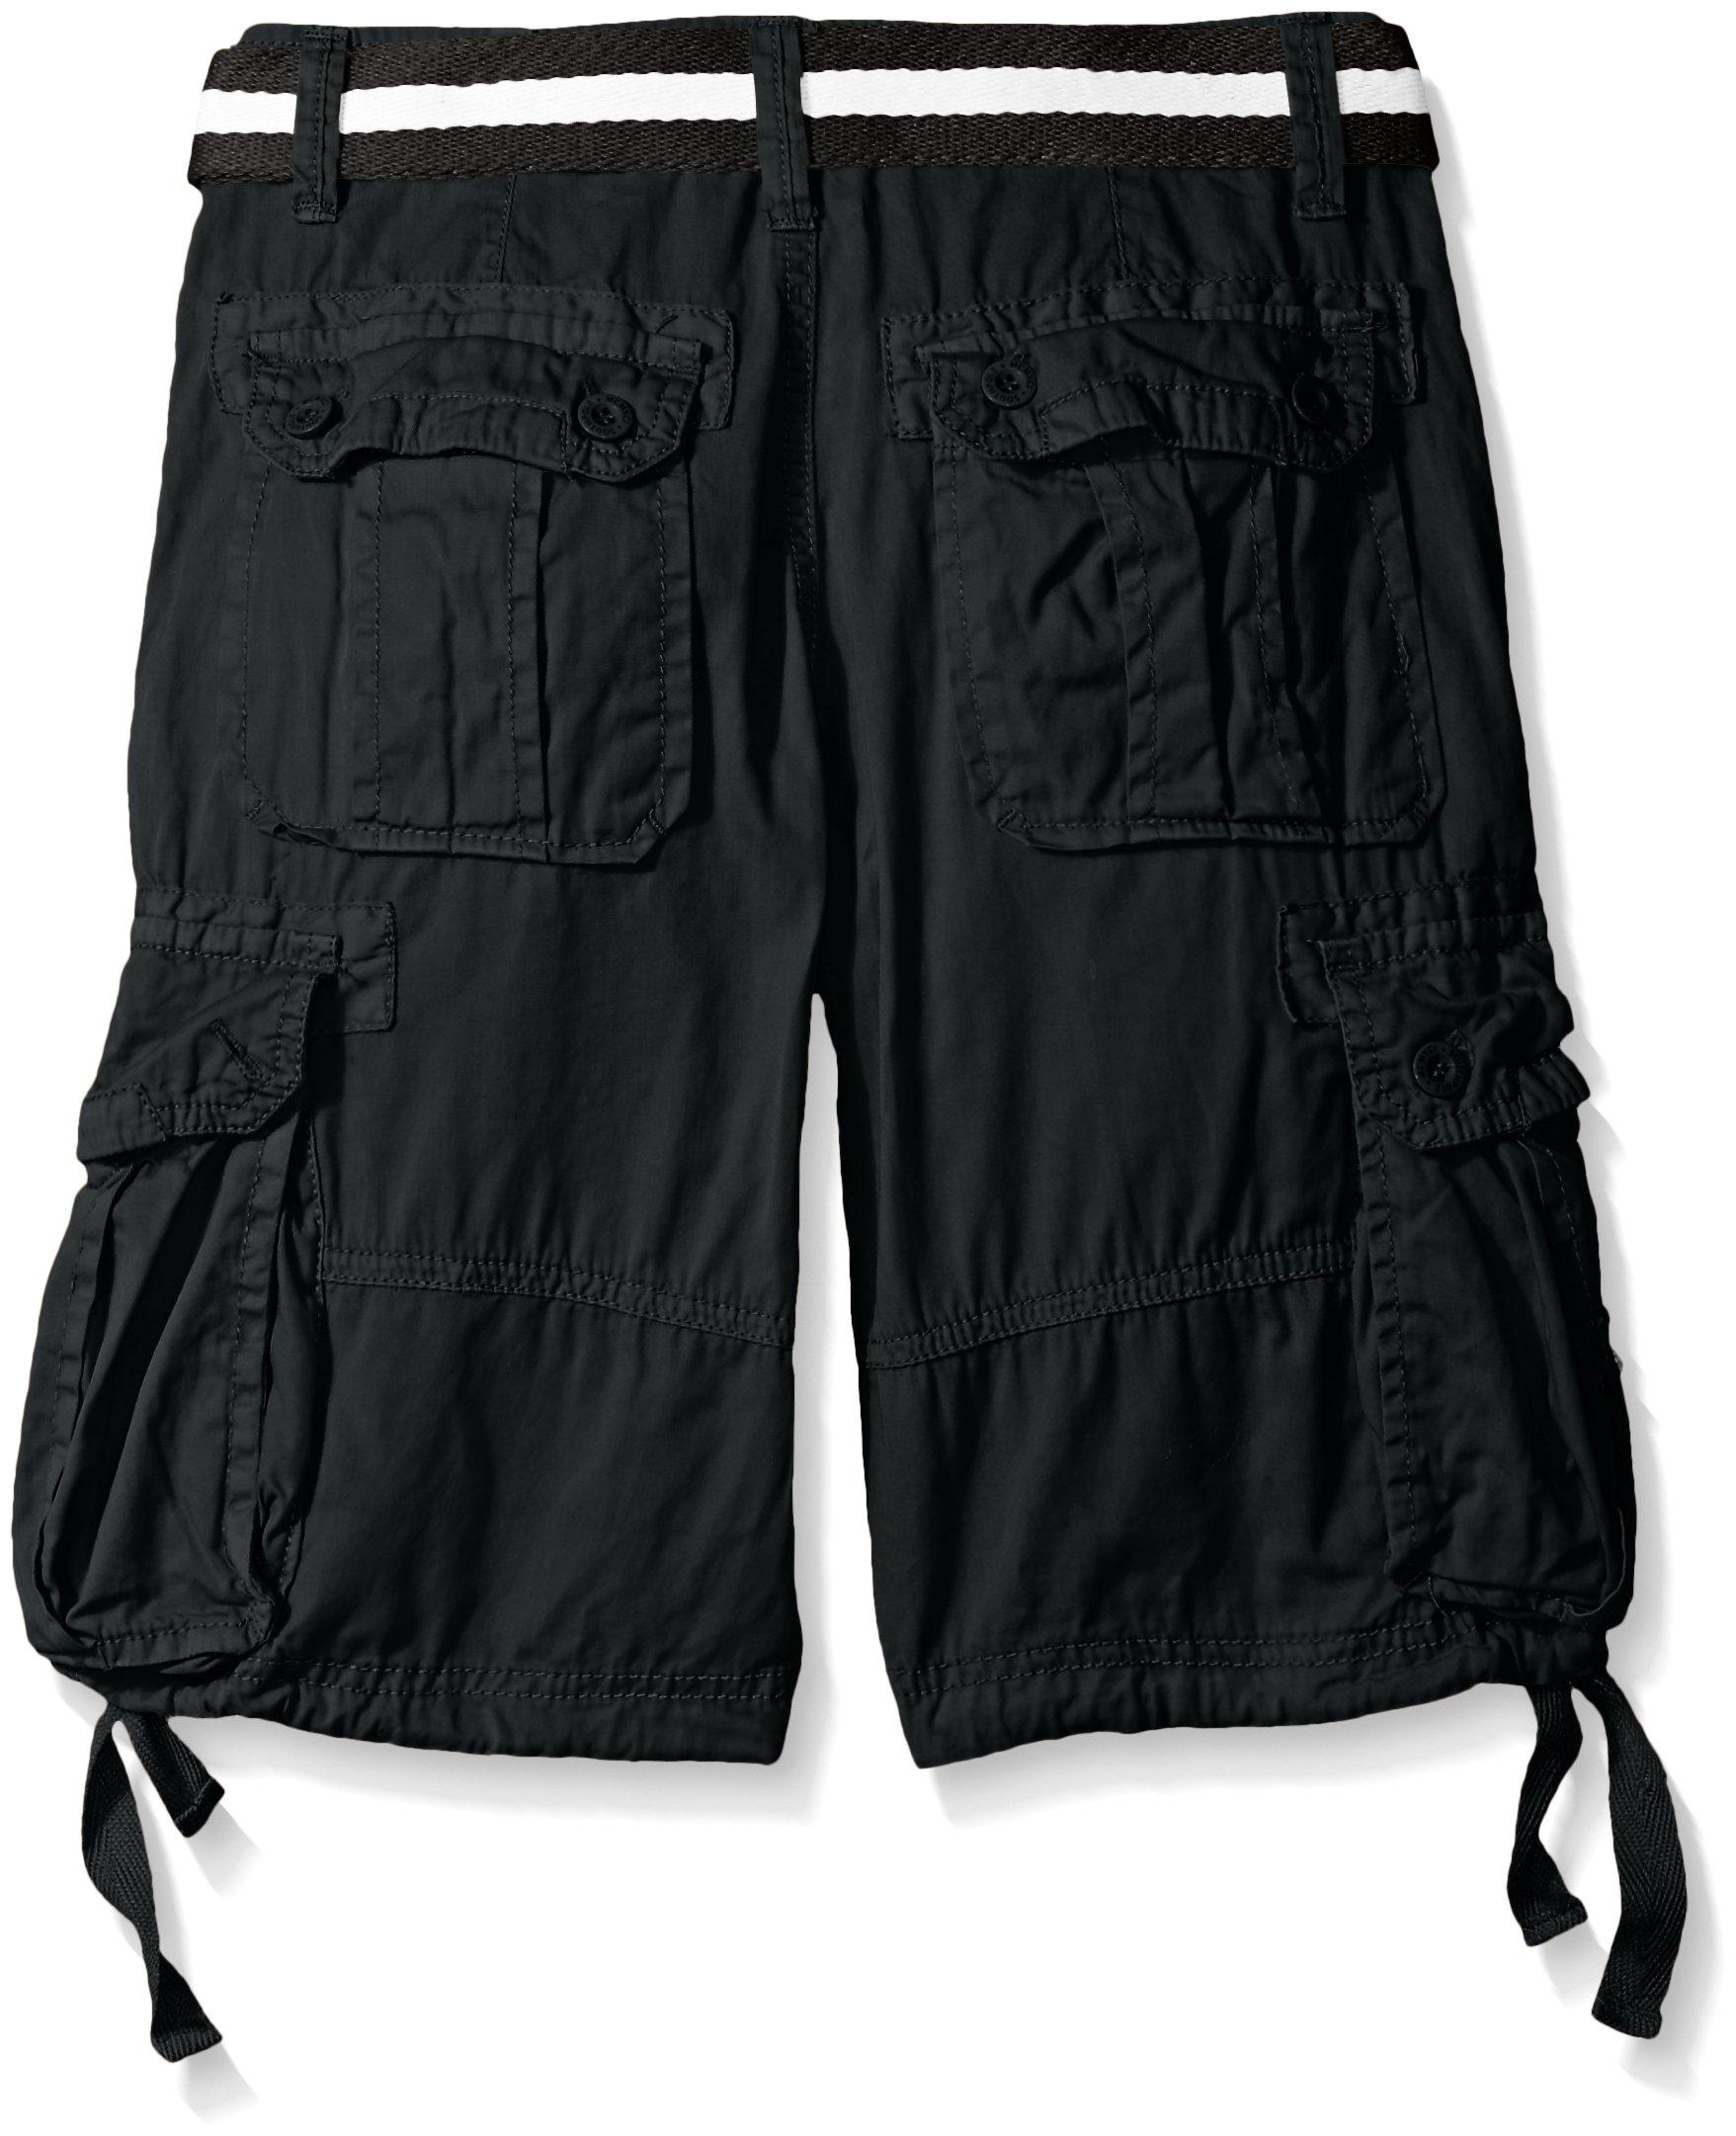 Southpole Big Boys Belted Fine Twill Basic Cargo Short, Black, 12 by Southpole (Image #2)